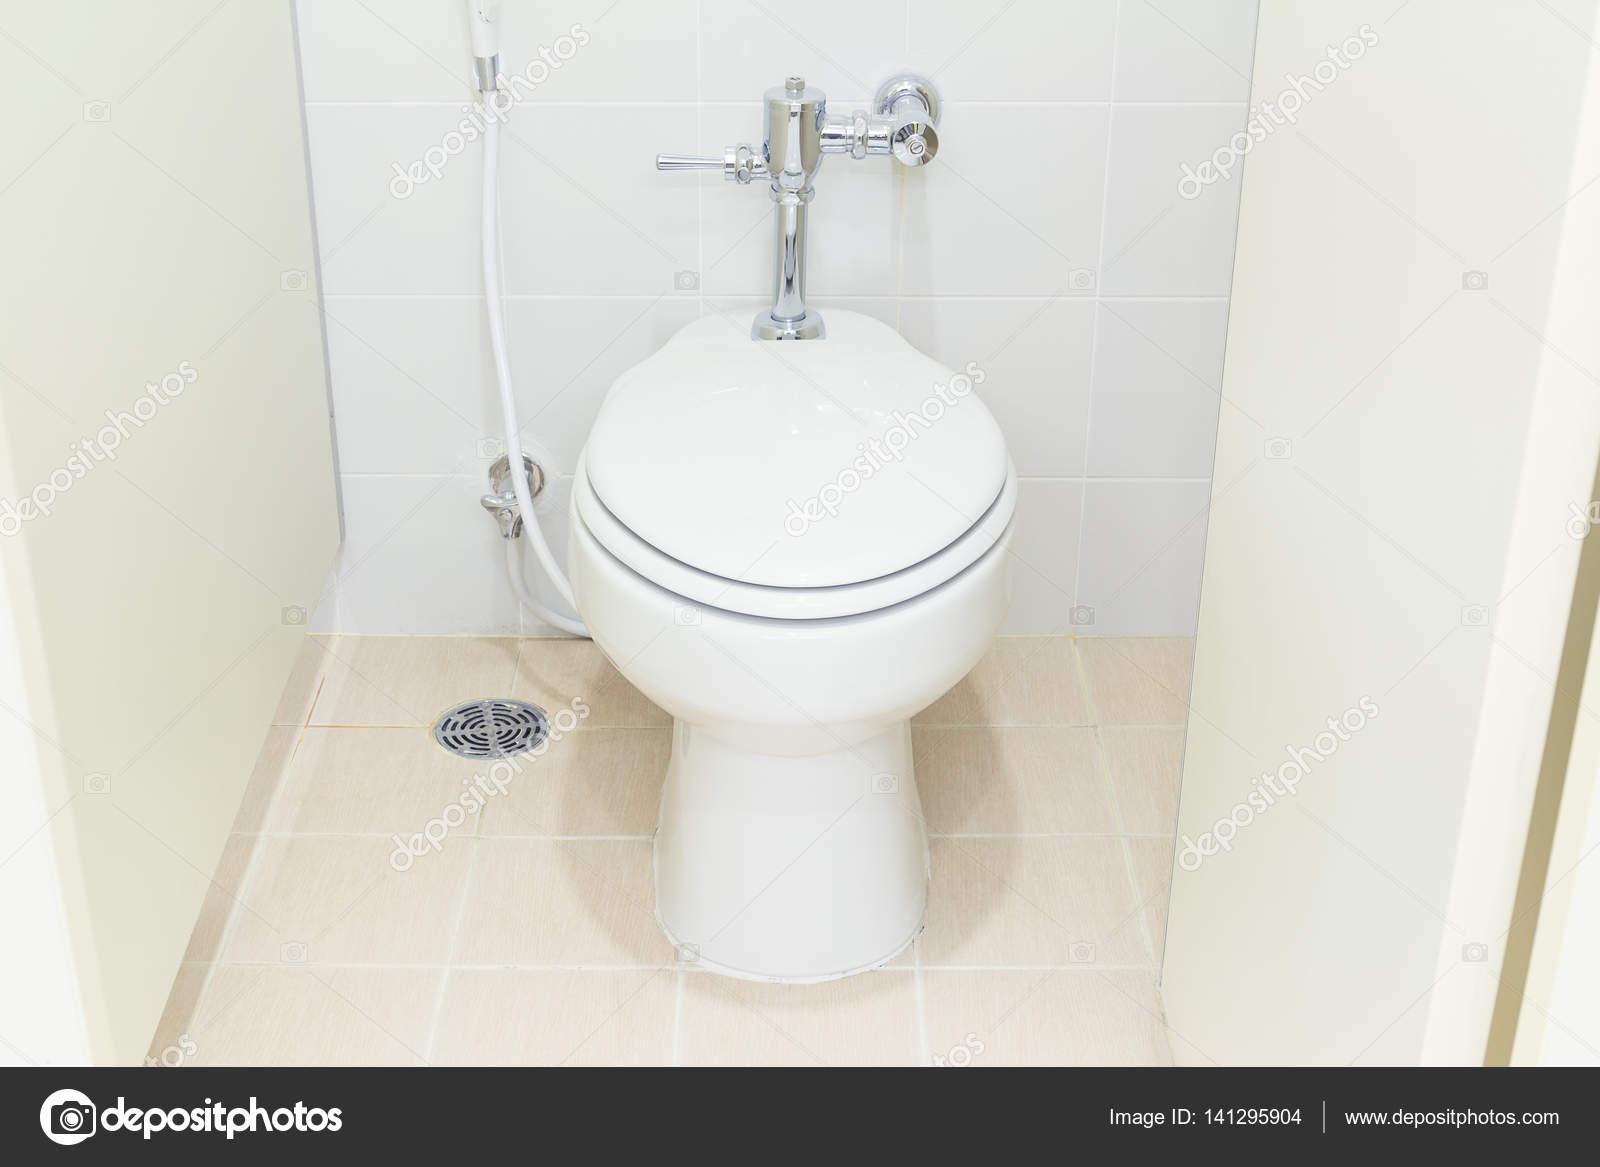 Water closet toilet — Stock Photo © roncivil #141295904